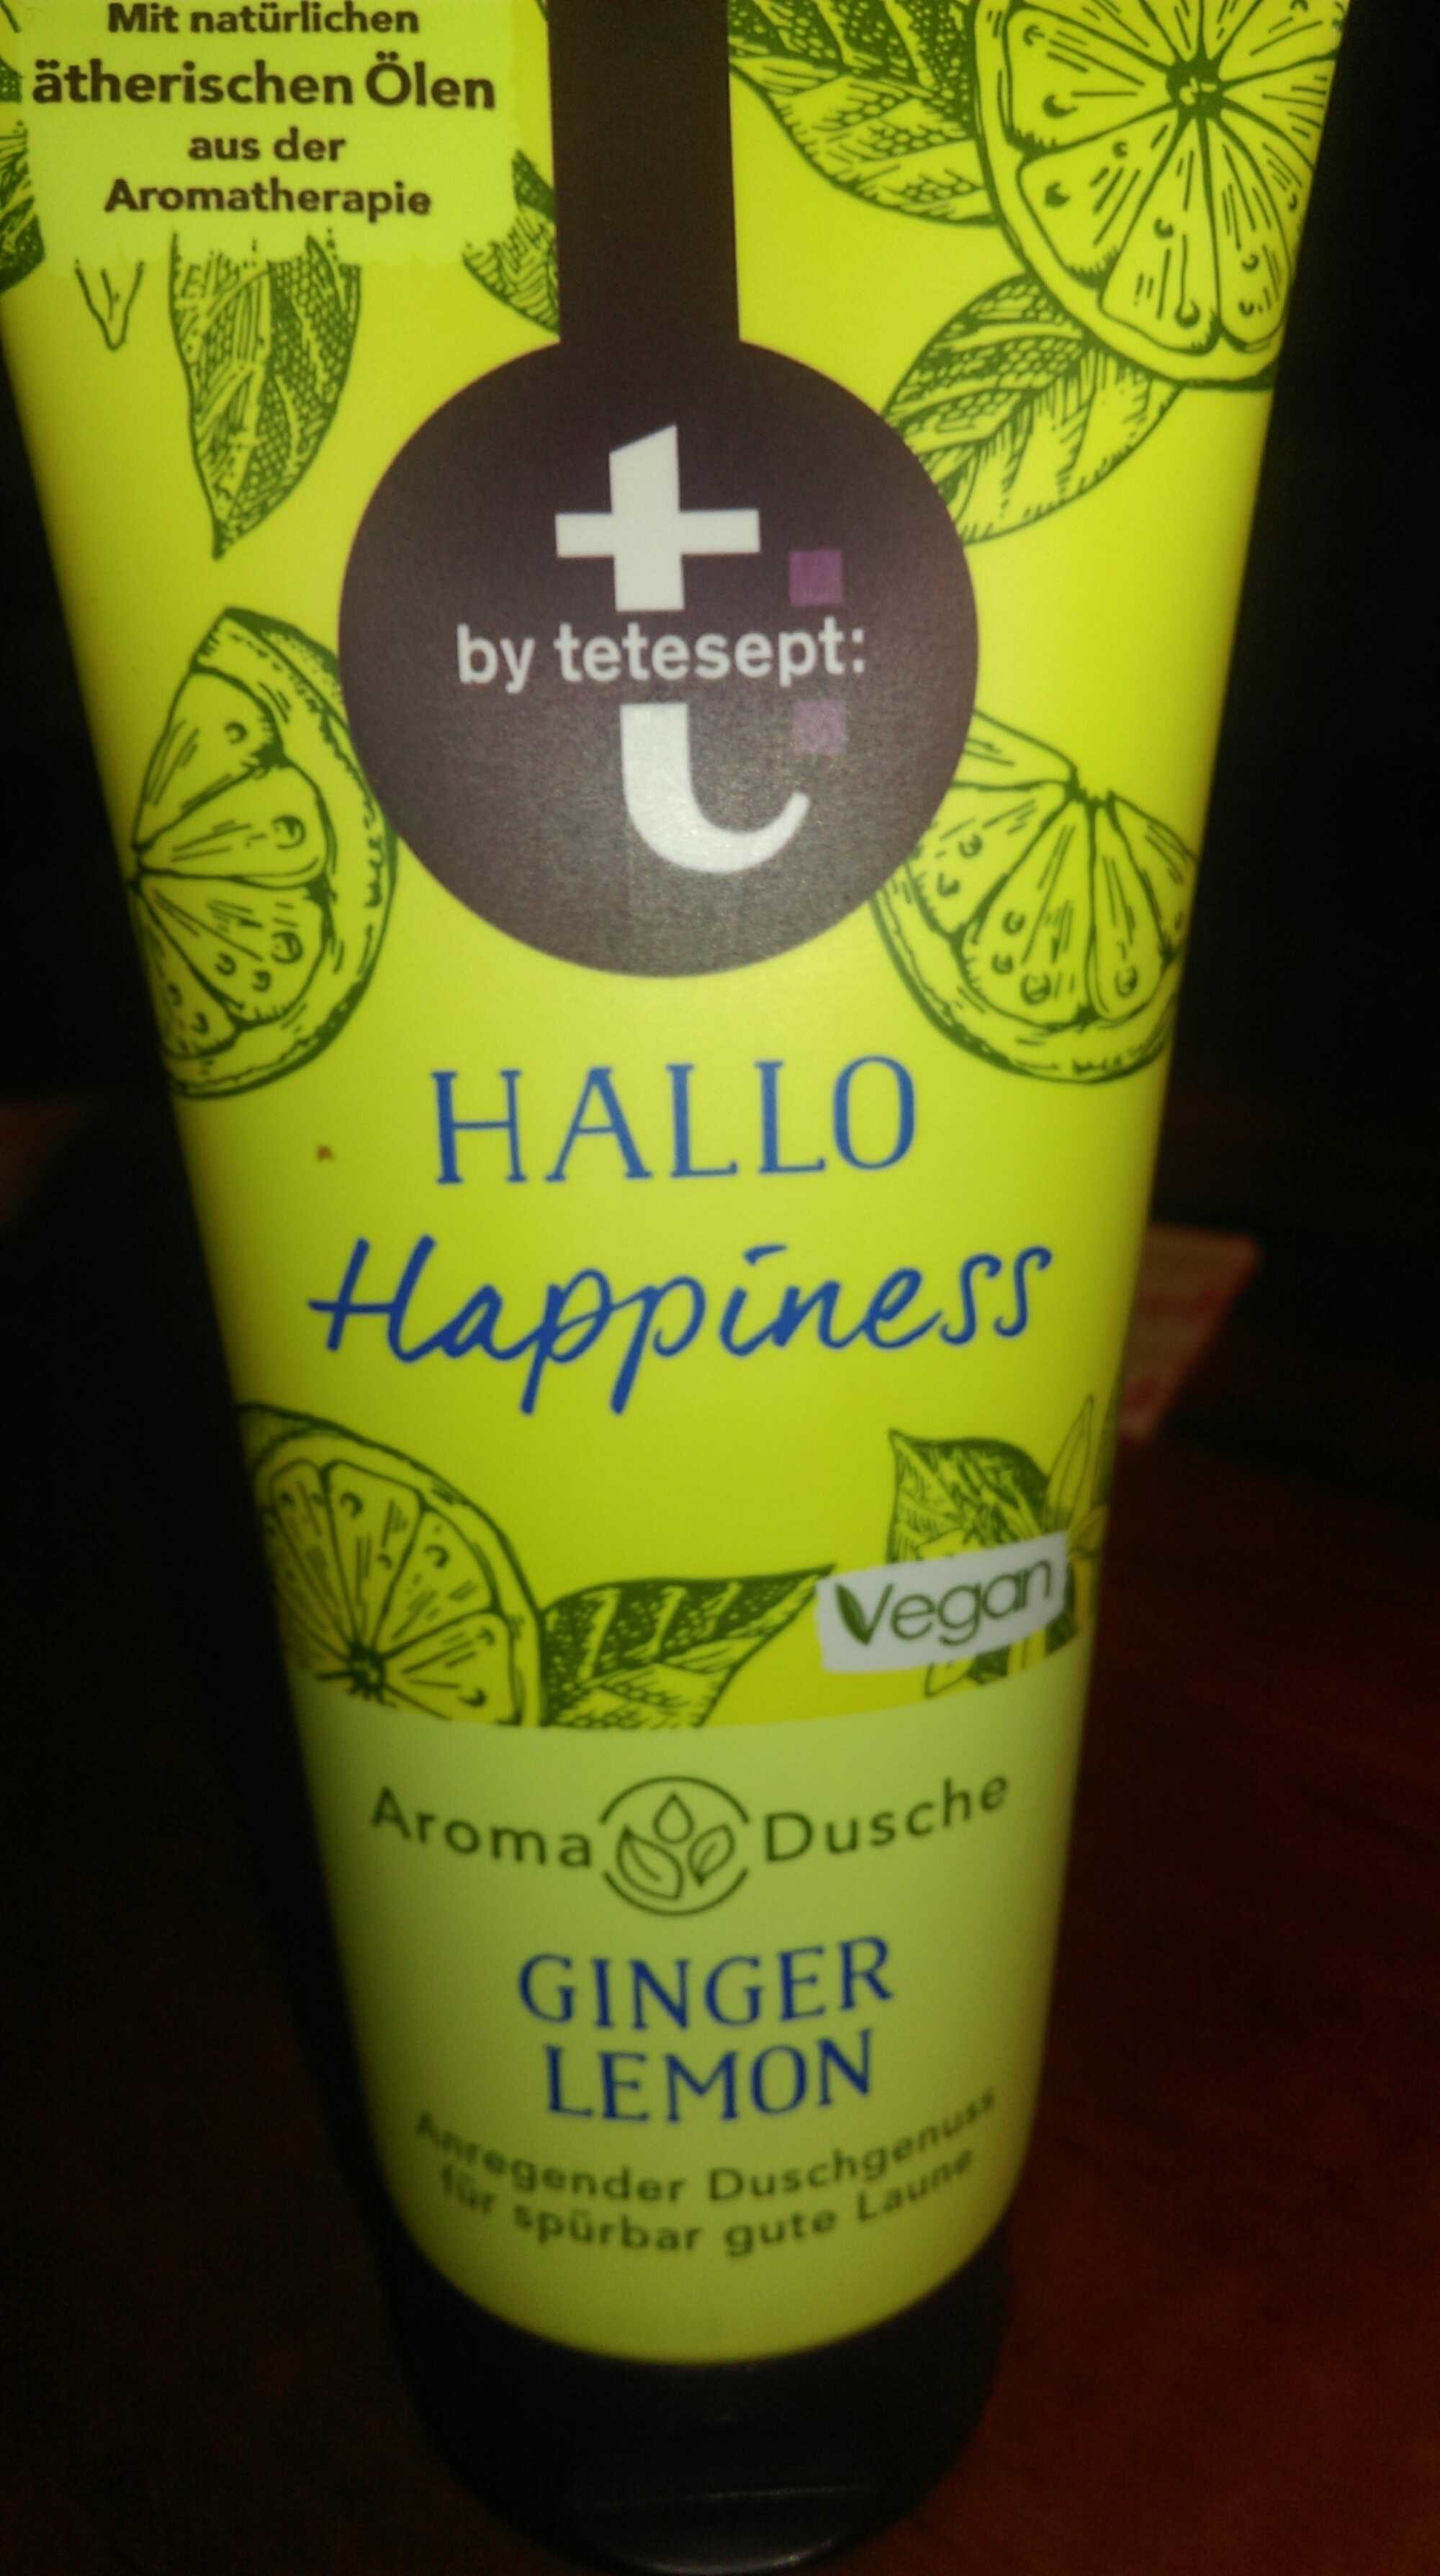 Hallo Happiness Ginger Lemon - Product